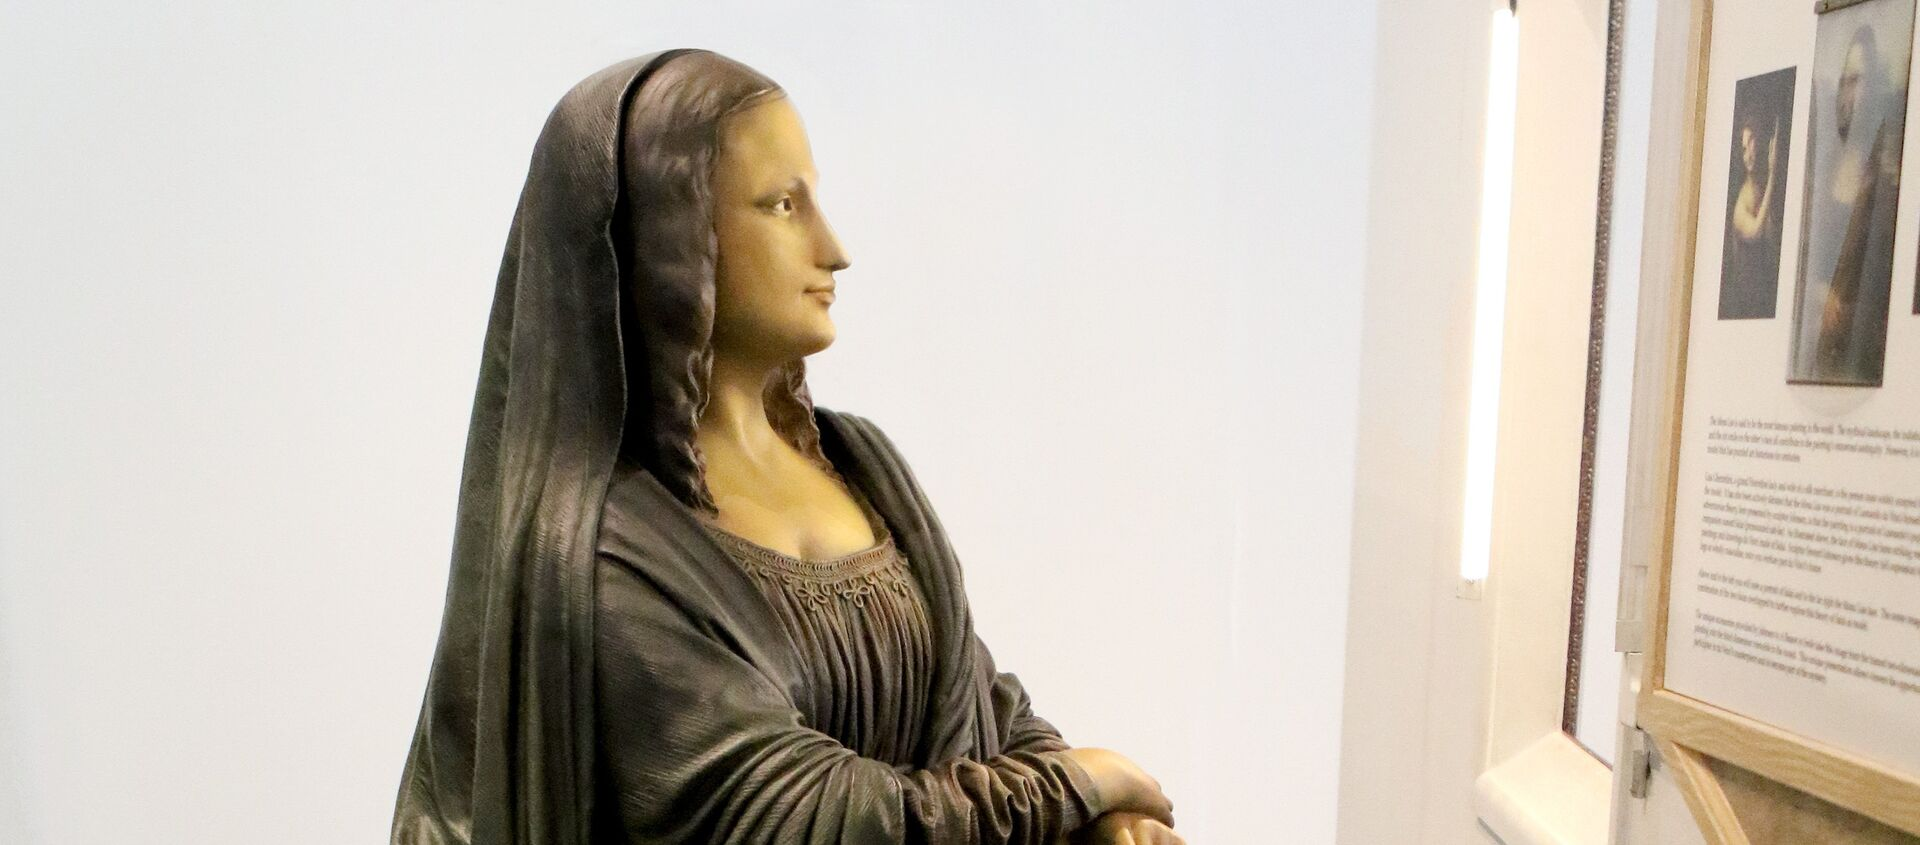 La Mona Lisa, imagen referencial - Sputnik Mundo, 1920, 09.08.2018